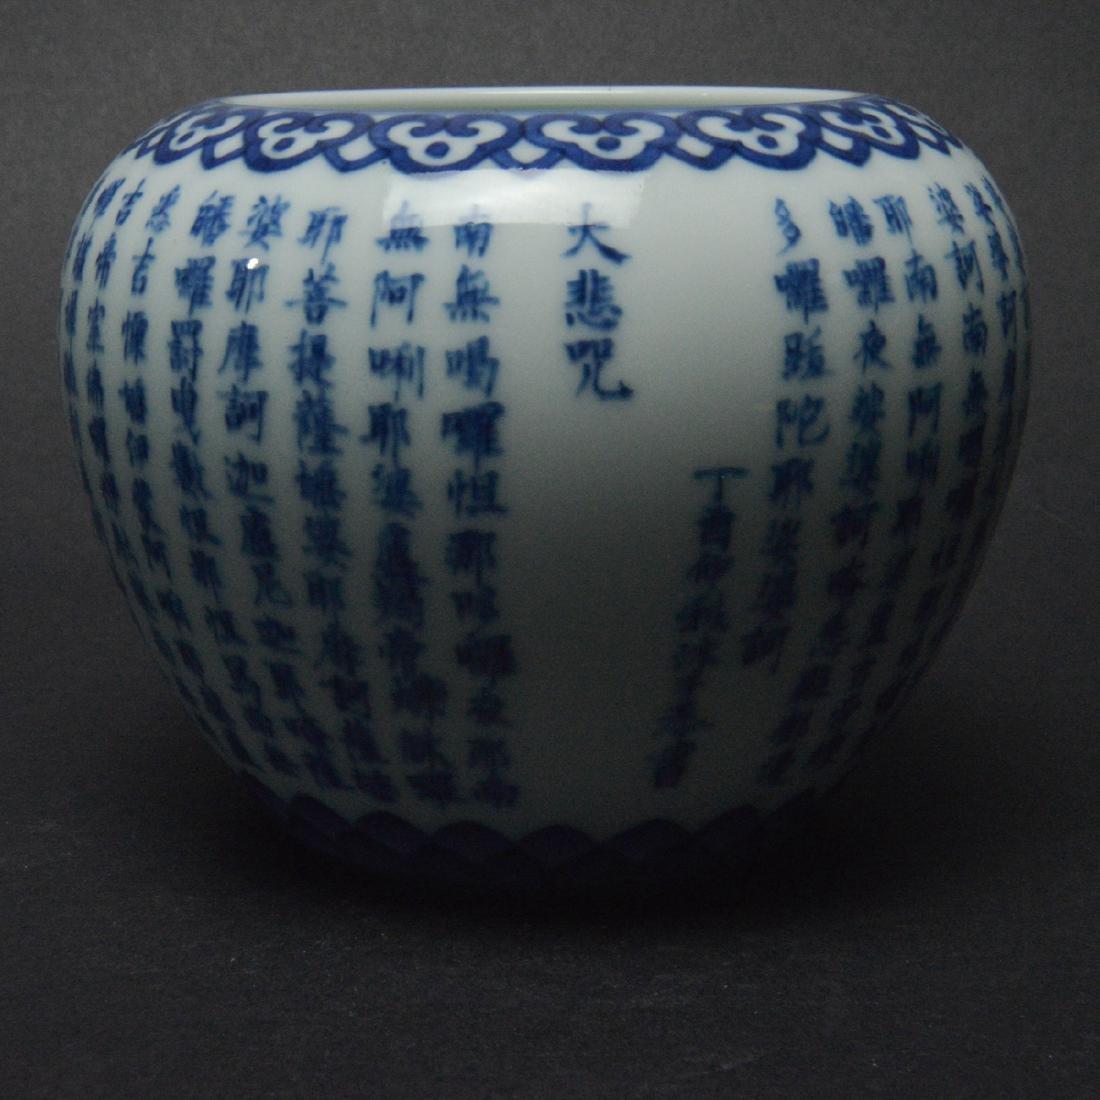 CHINESE BLUE AND WHITE PORCELAIN BRUSH WASHER - 5